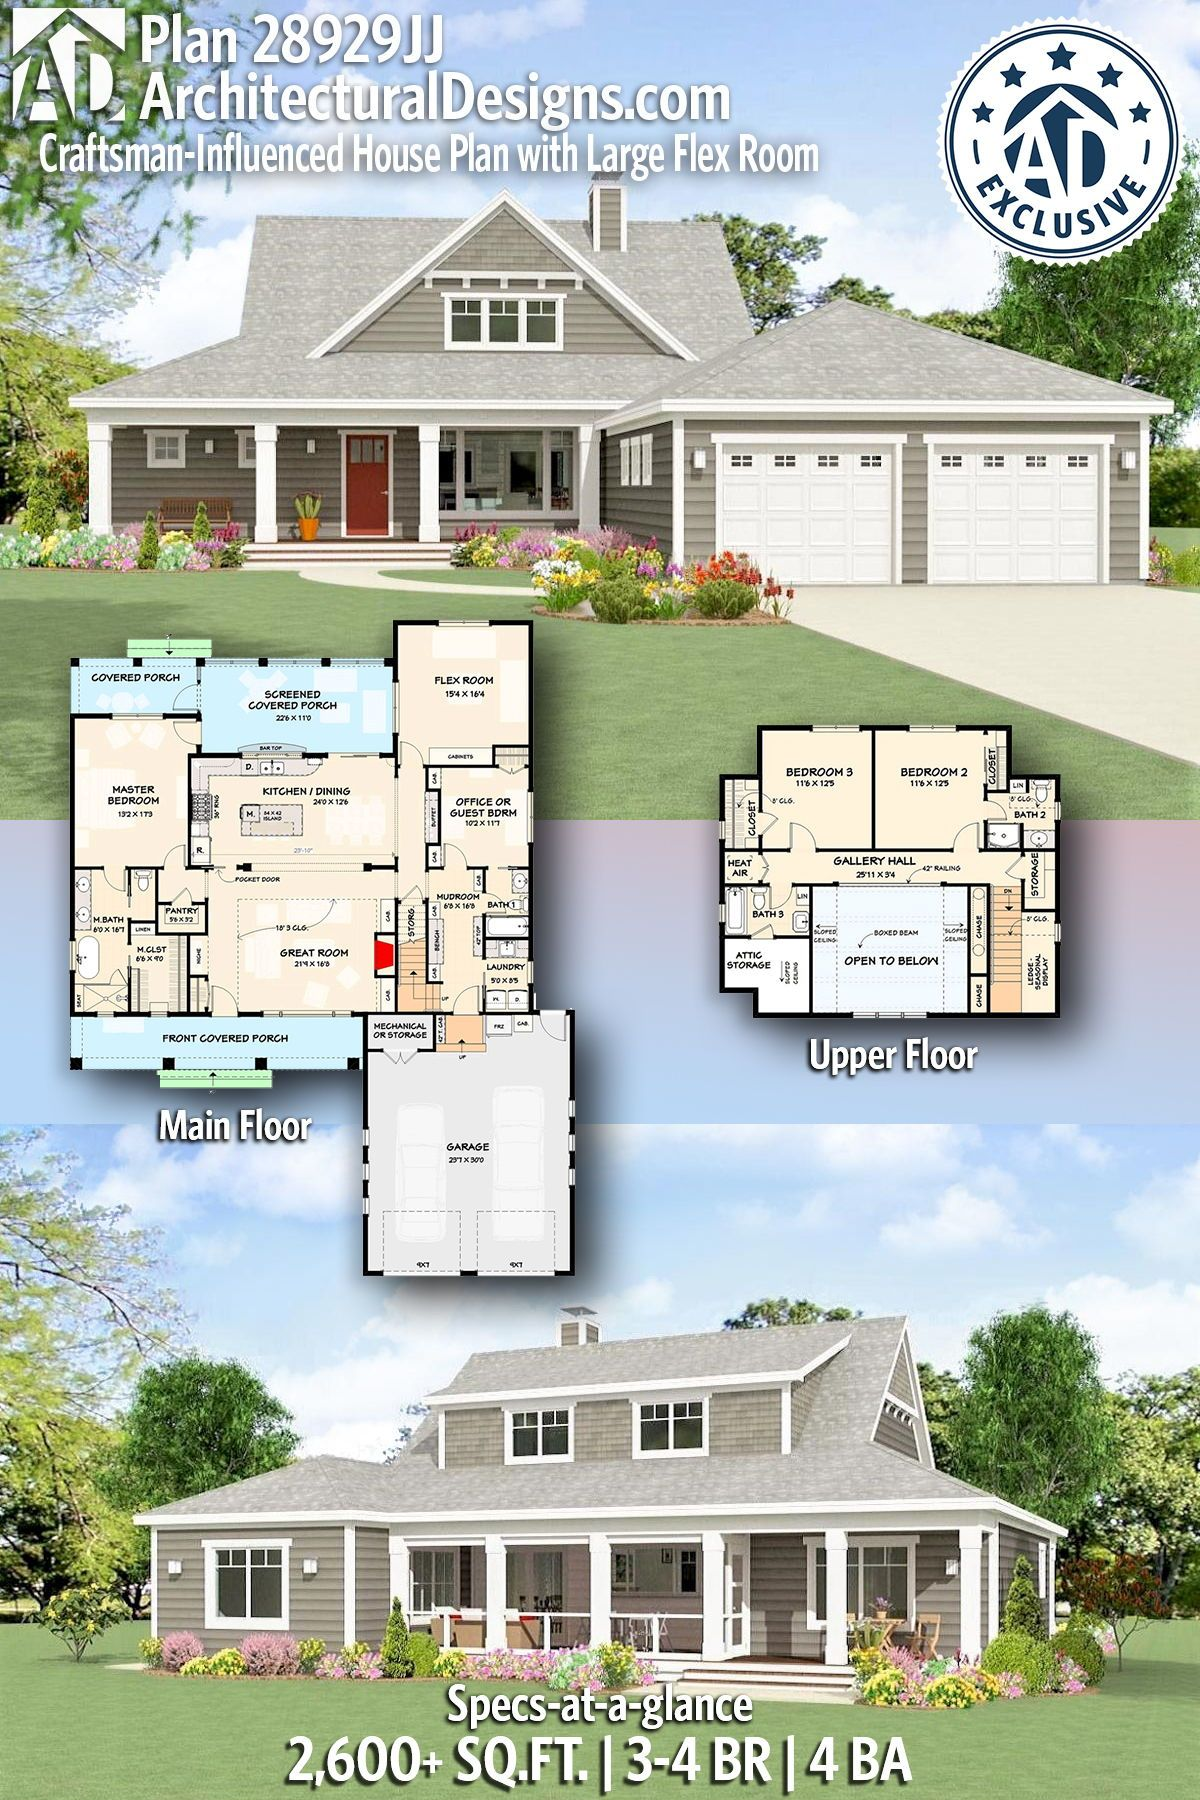 Plan 28929jj Craftsman Influenced House Plan With Large Flex Room Affordable House Plans Craftsman House Plans House Plans